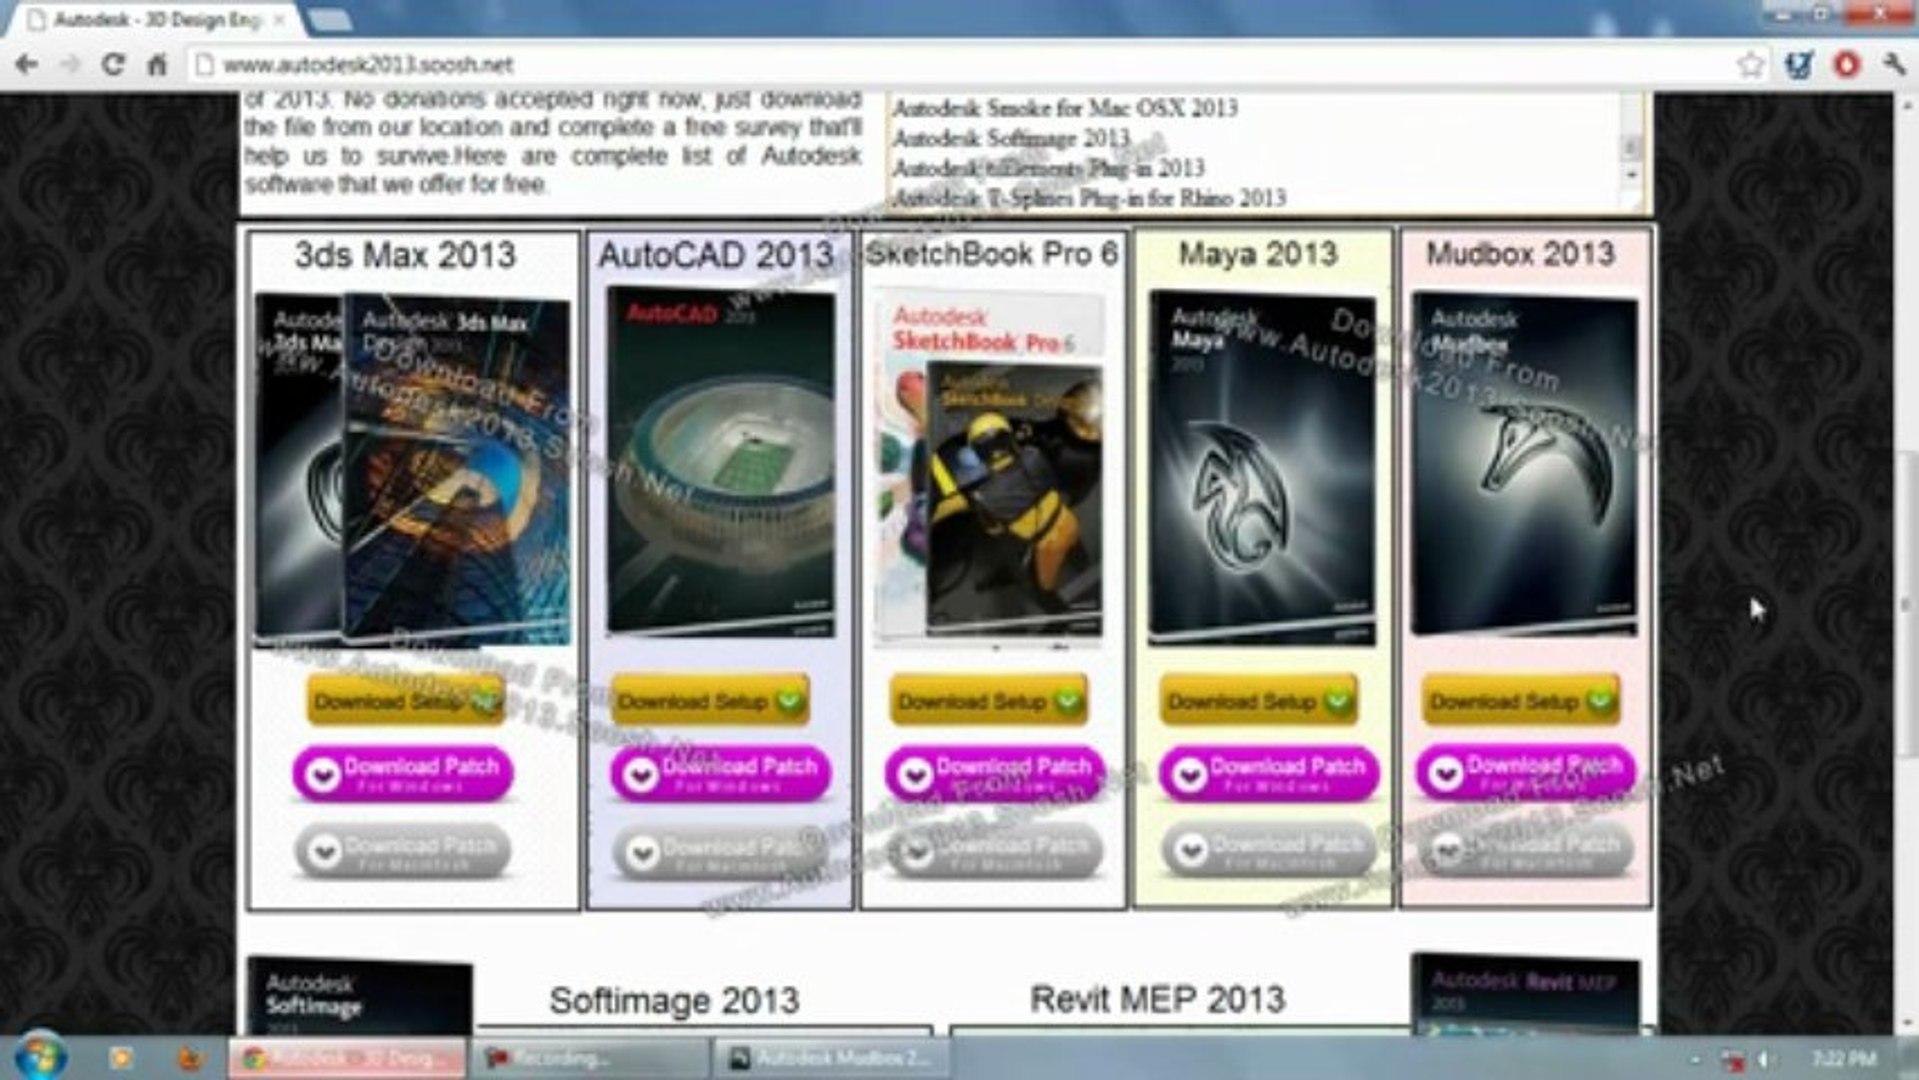 Download Autodesk Revit MEP 2013 Full Version for FREE